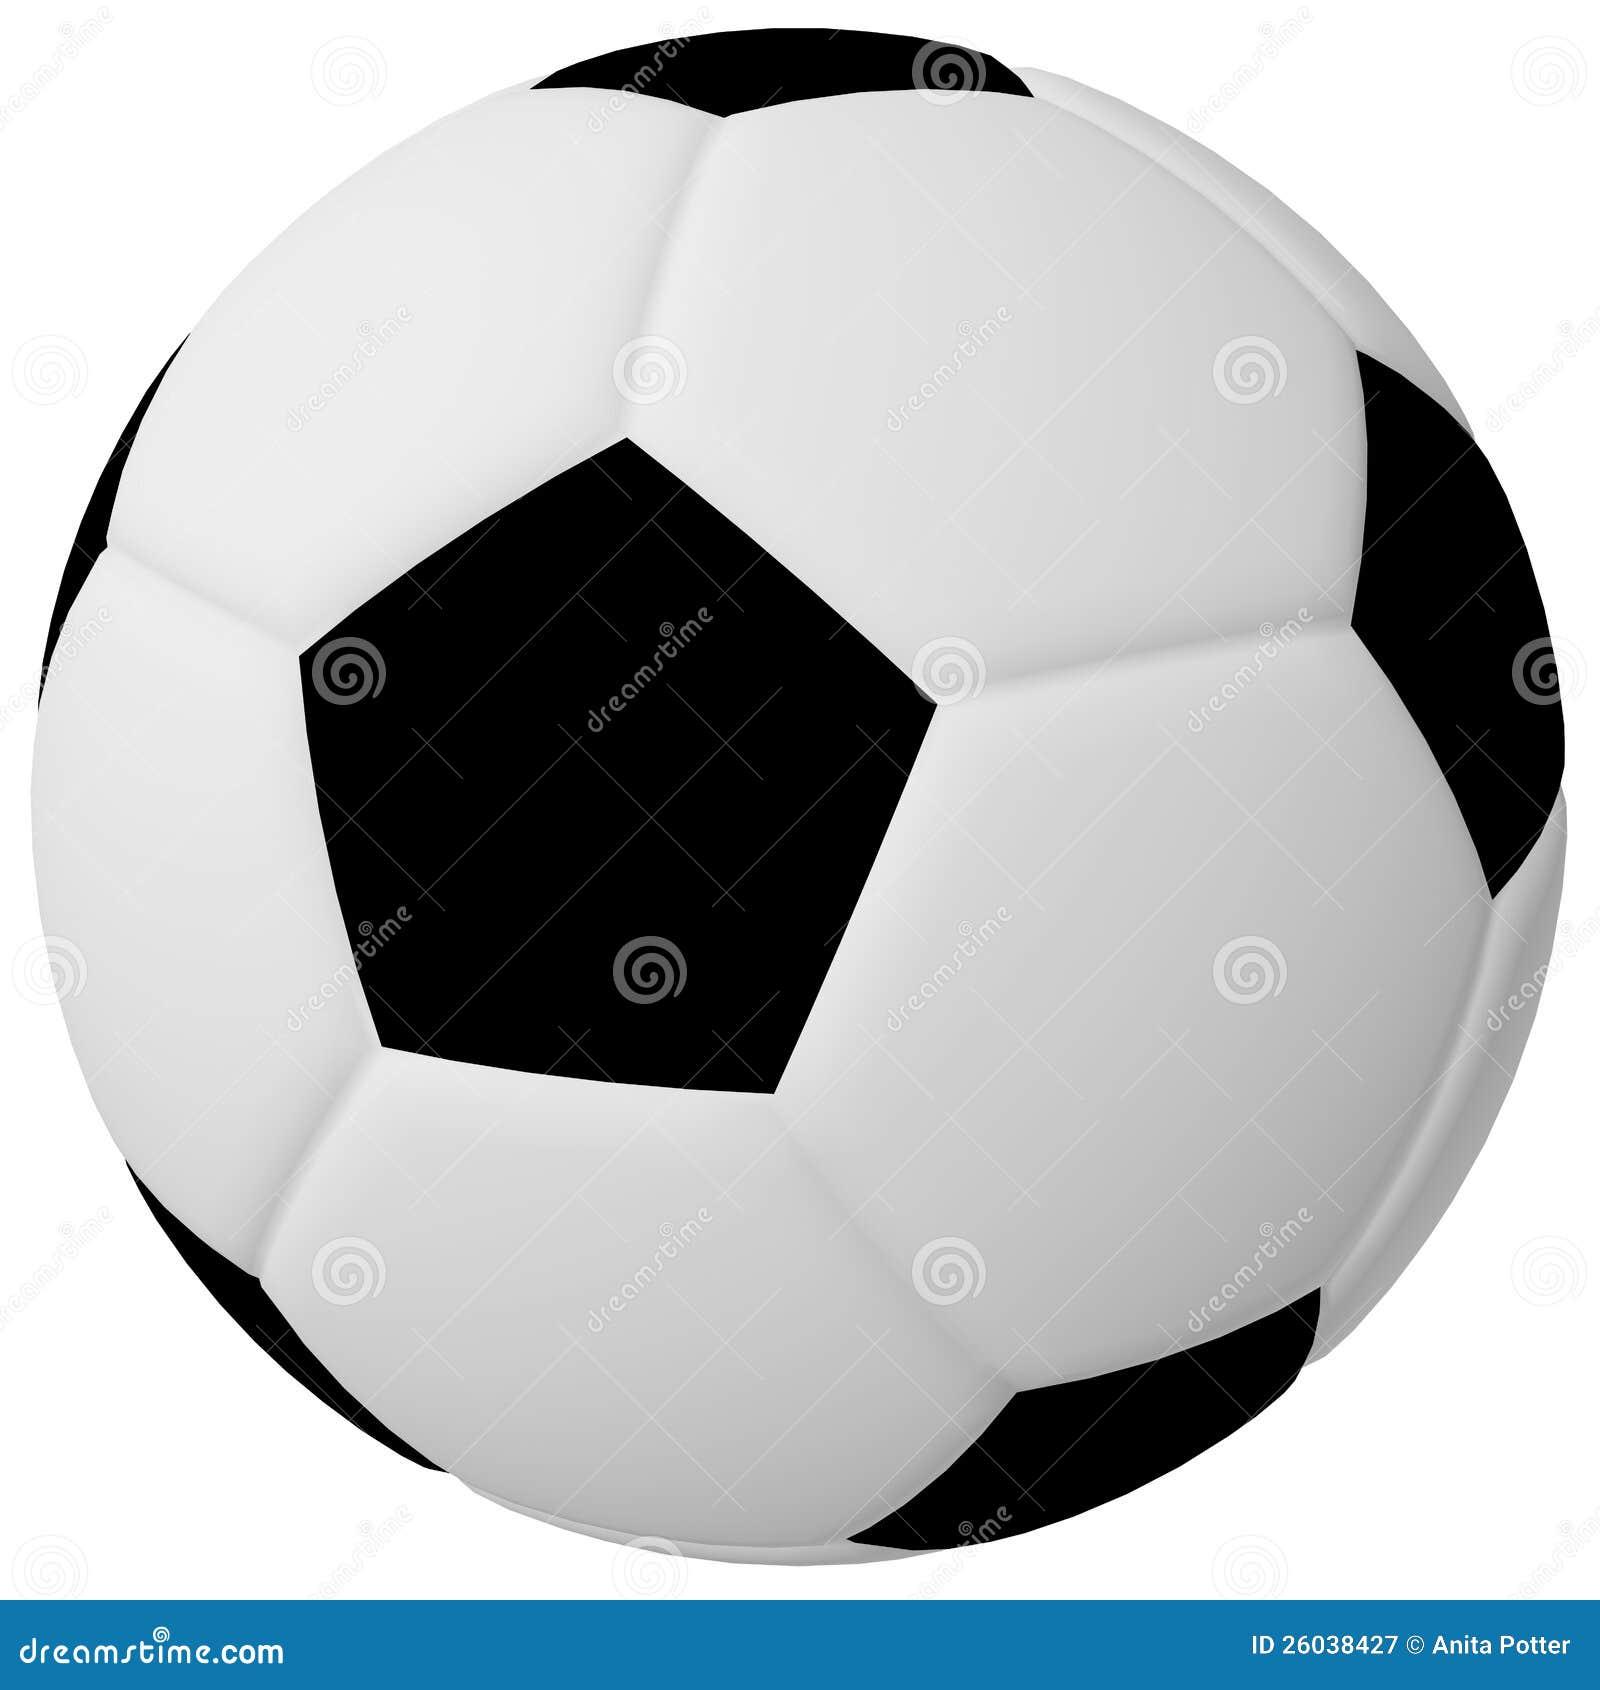 3d Render Of A Soccer/Football Ball Stock Illustration ...